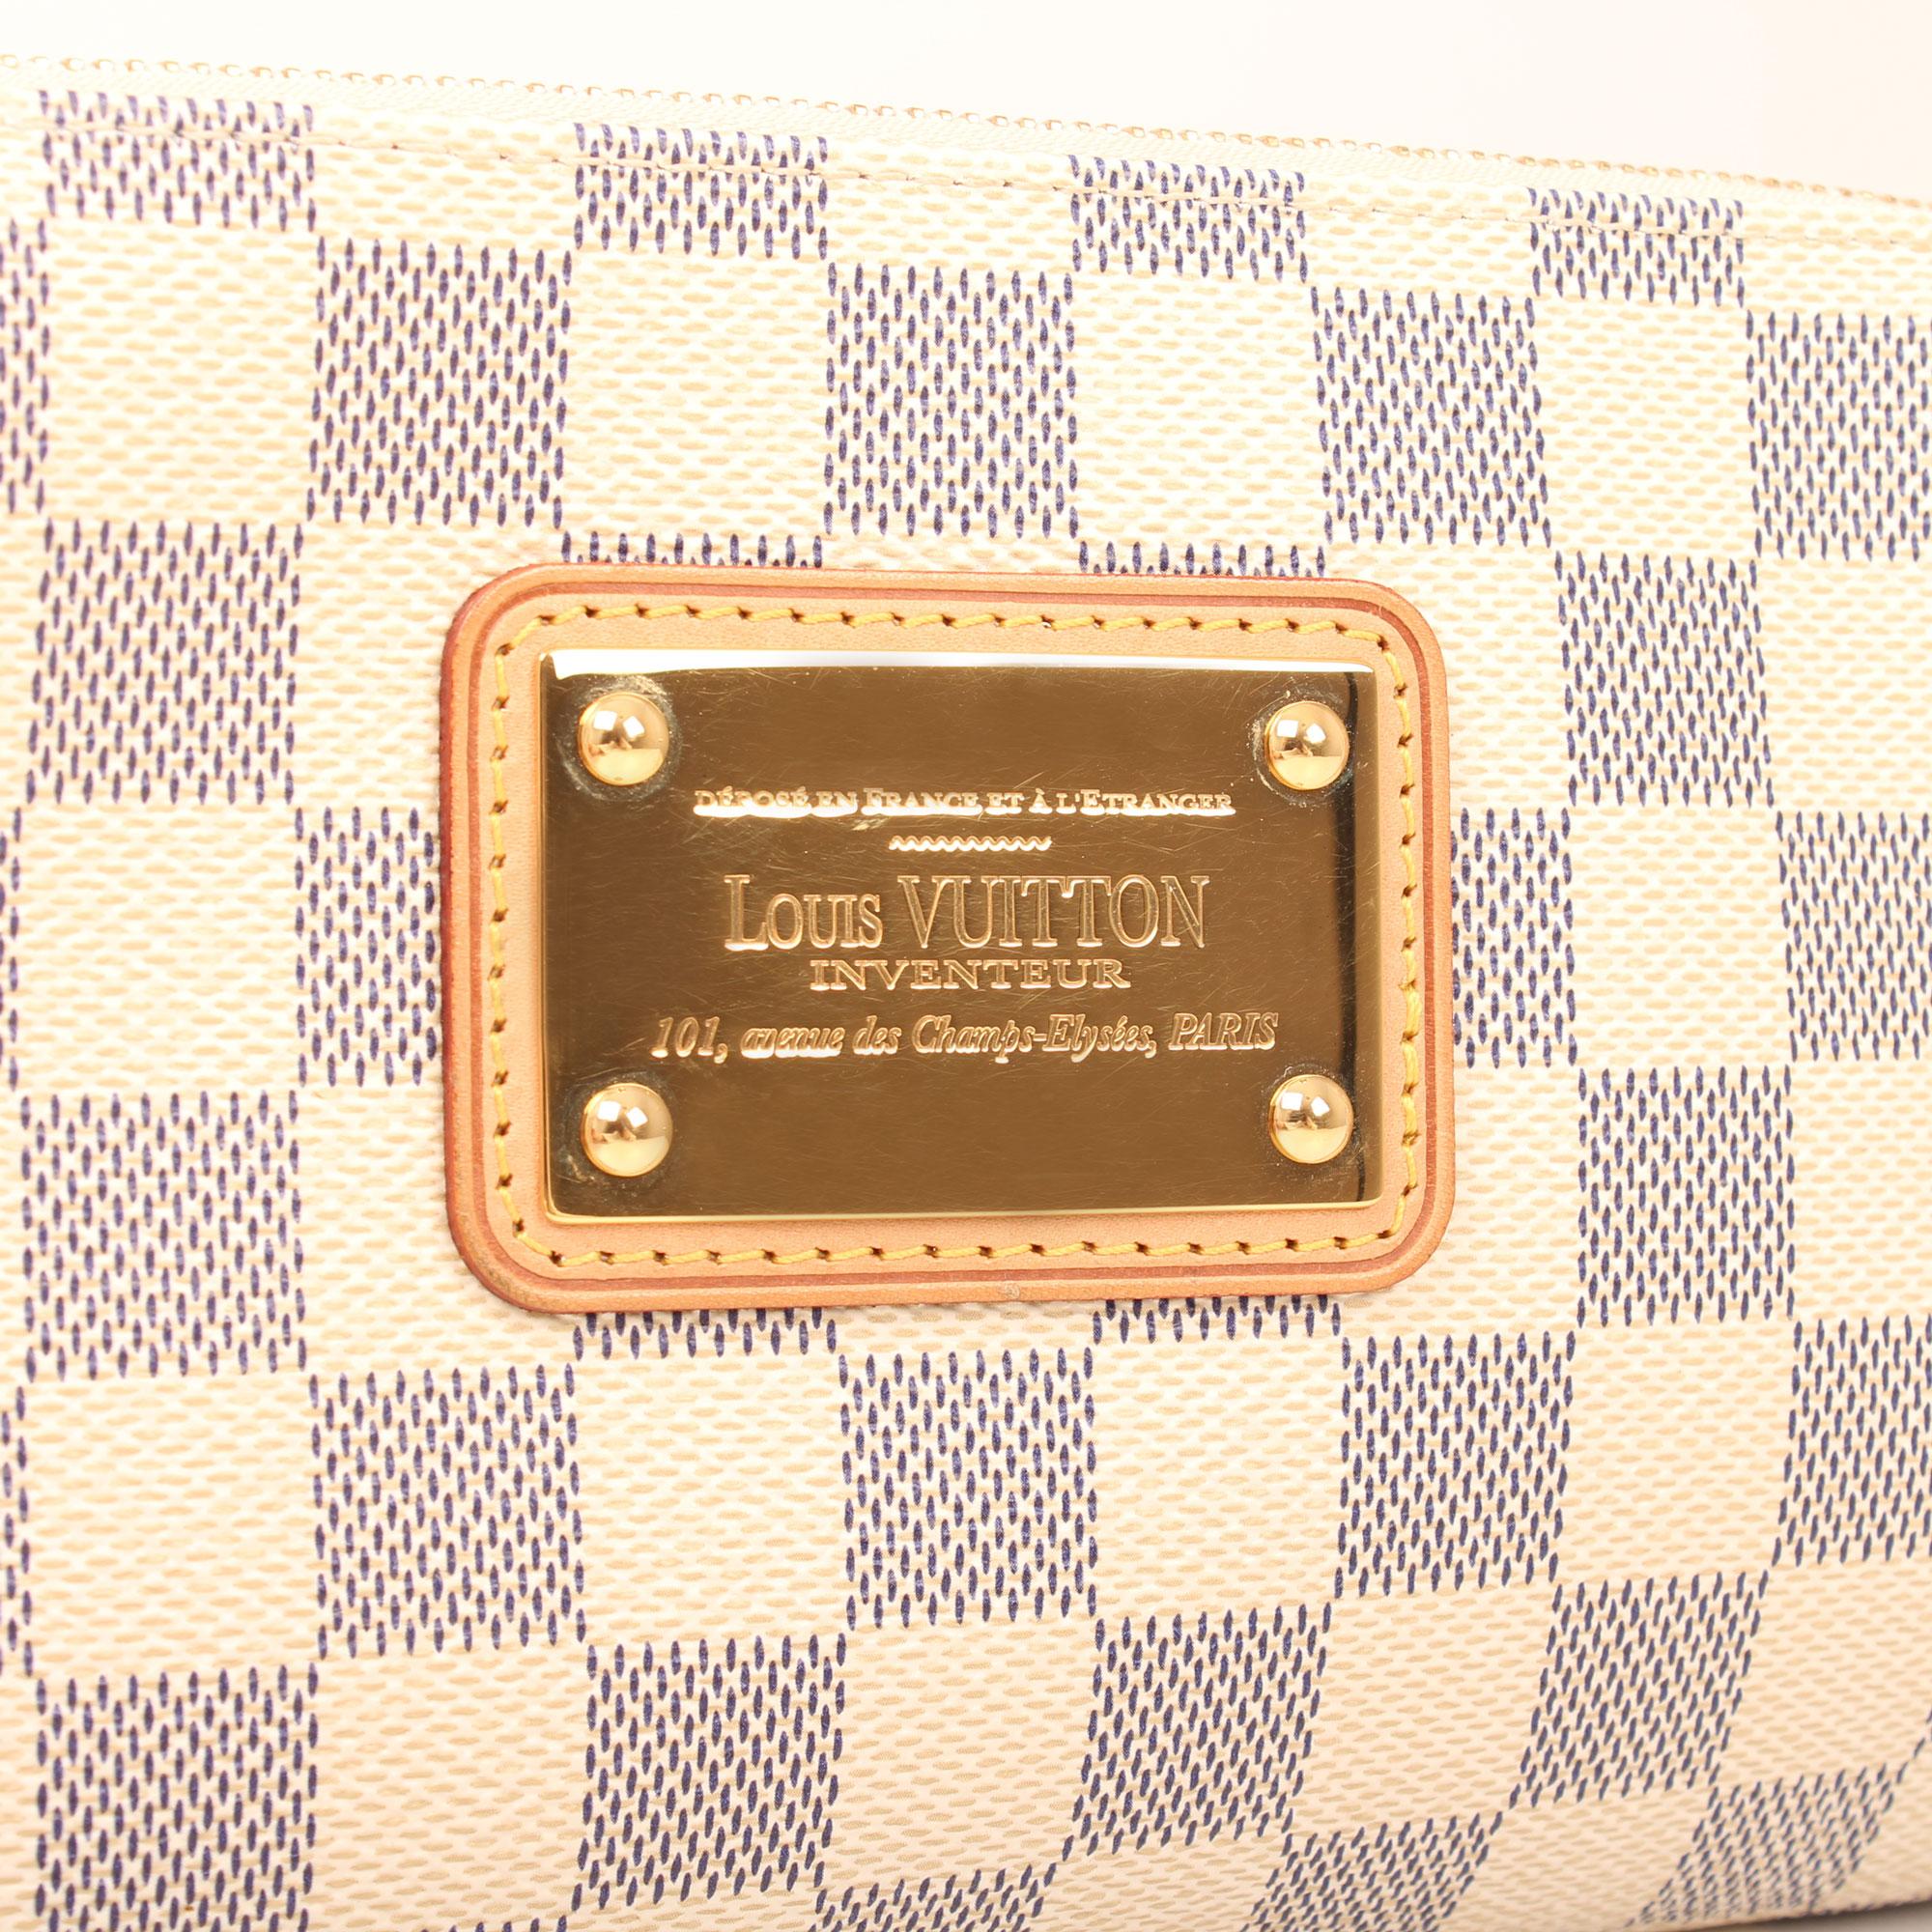 pochette-louis-vuitton-eva-damier-azur-chapa